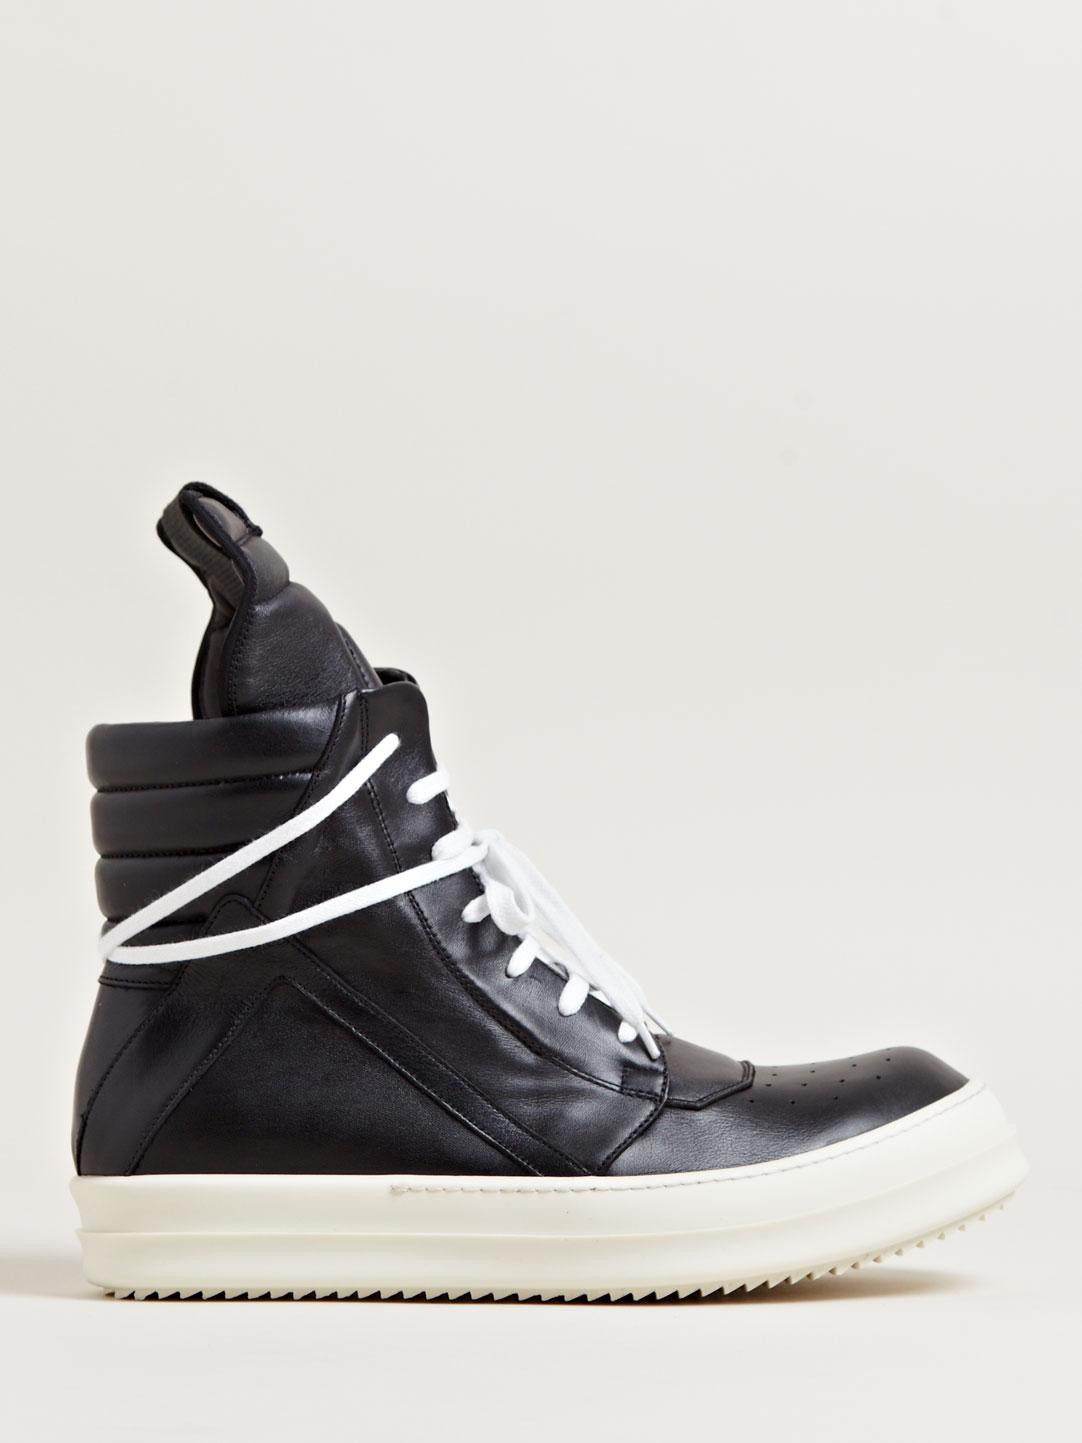 lyst rick owens mens geobasket sneakers in black for men. Black Bedroom Furniture Sets. Home Design Ideas